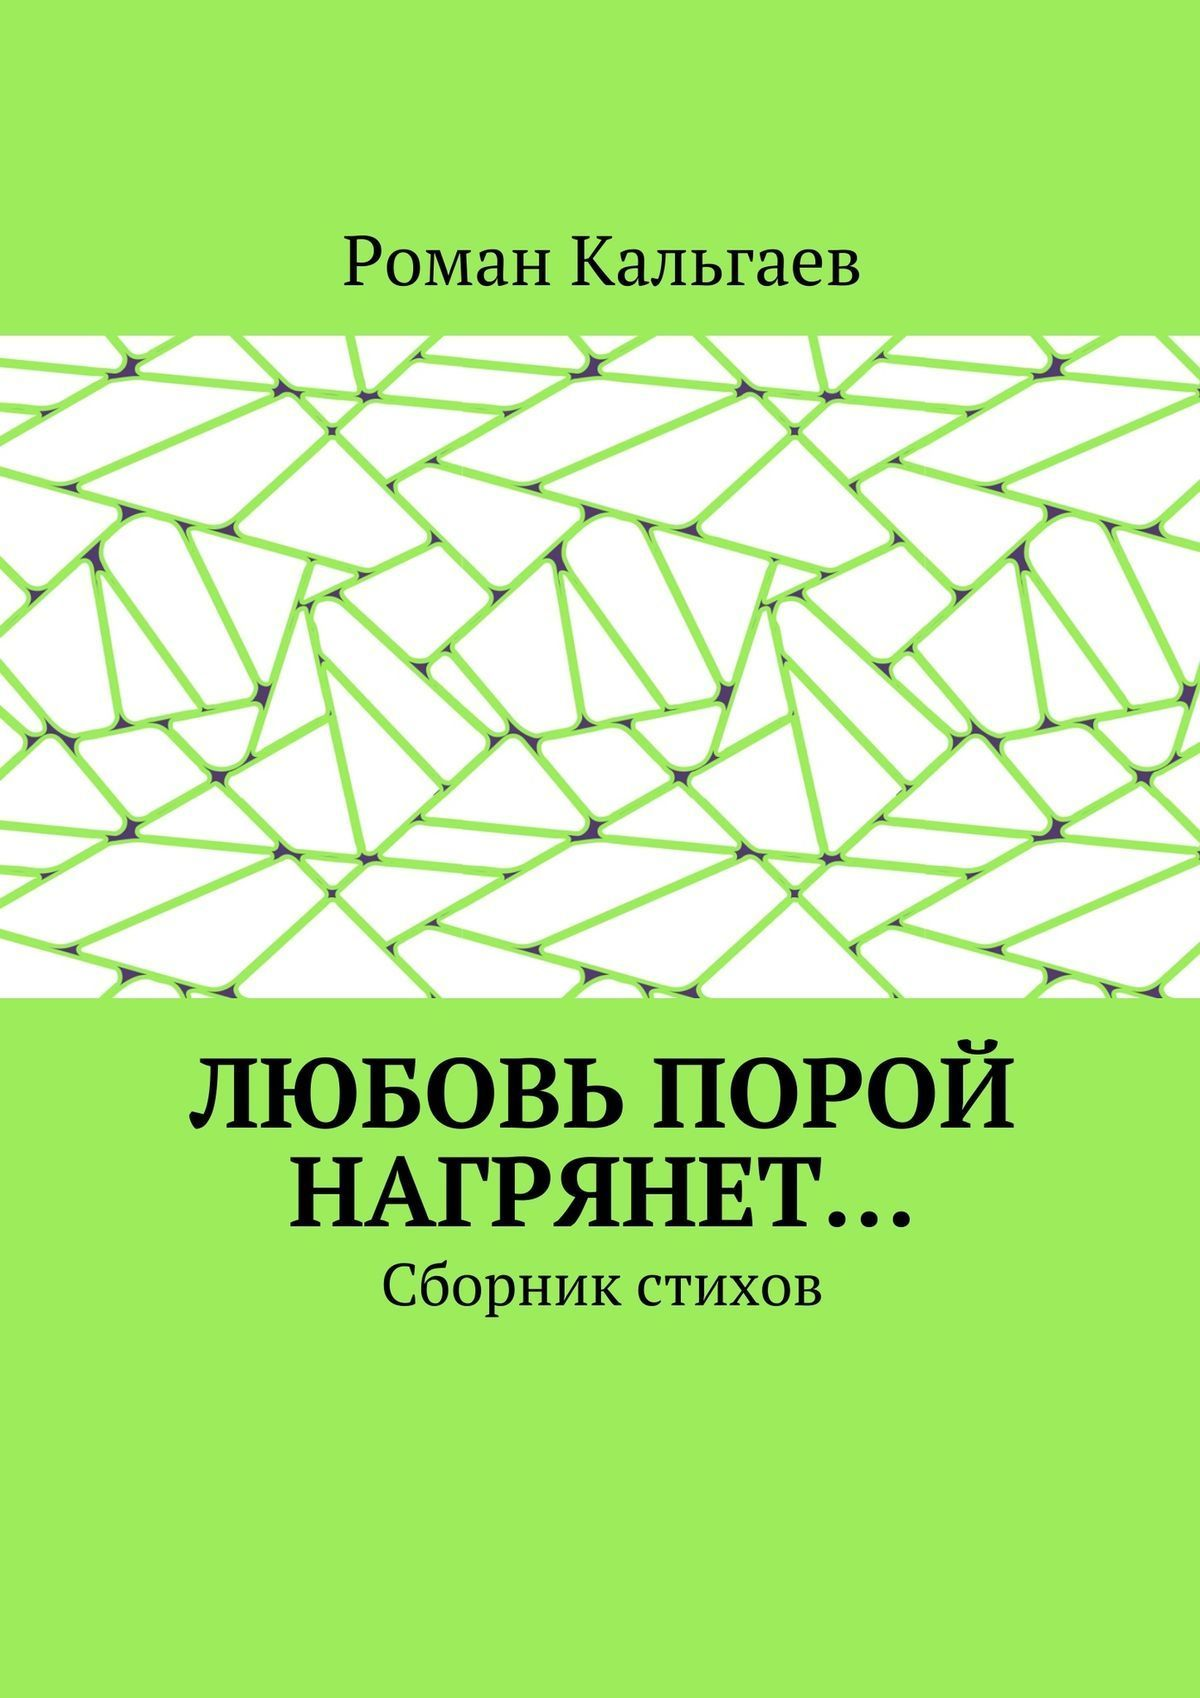 Роман Кальгаев бесплатно